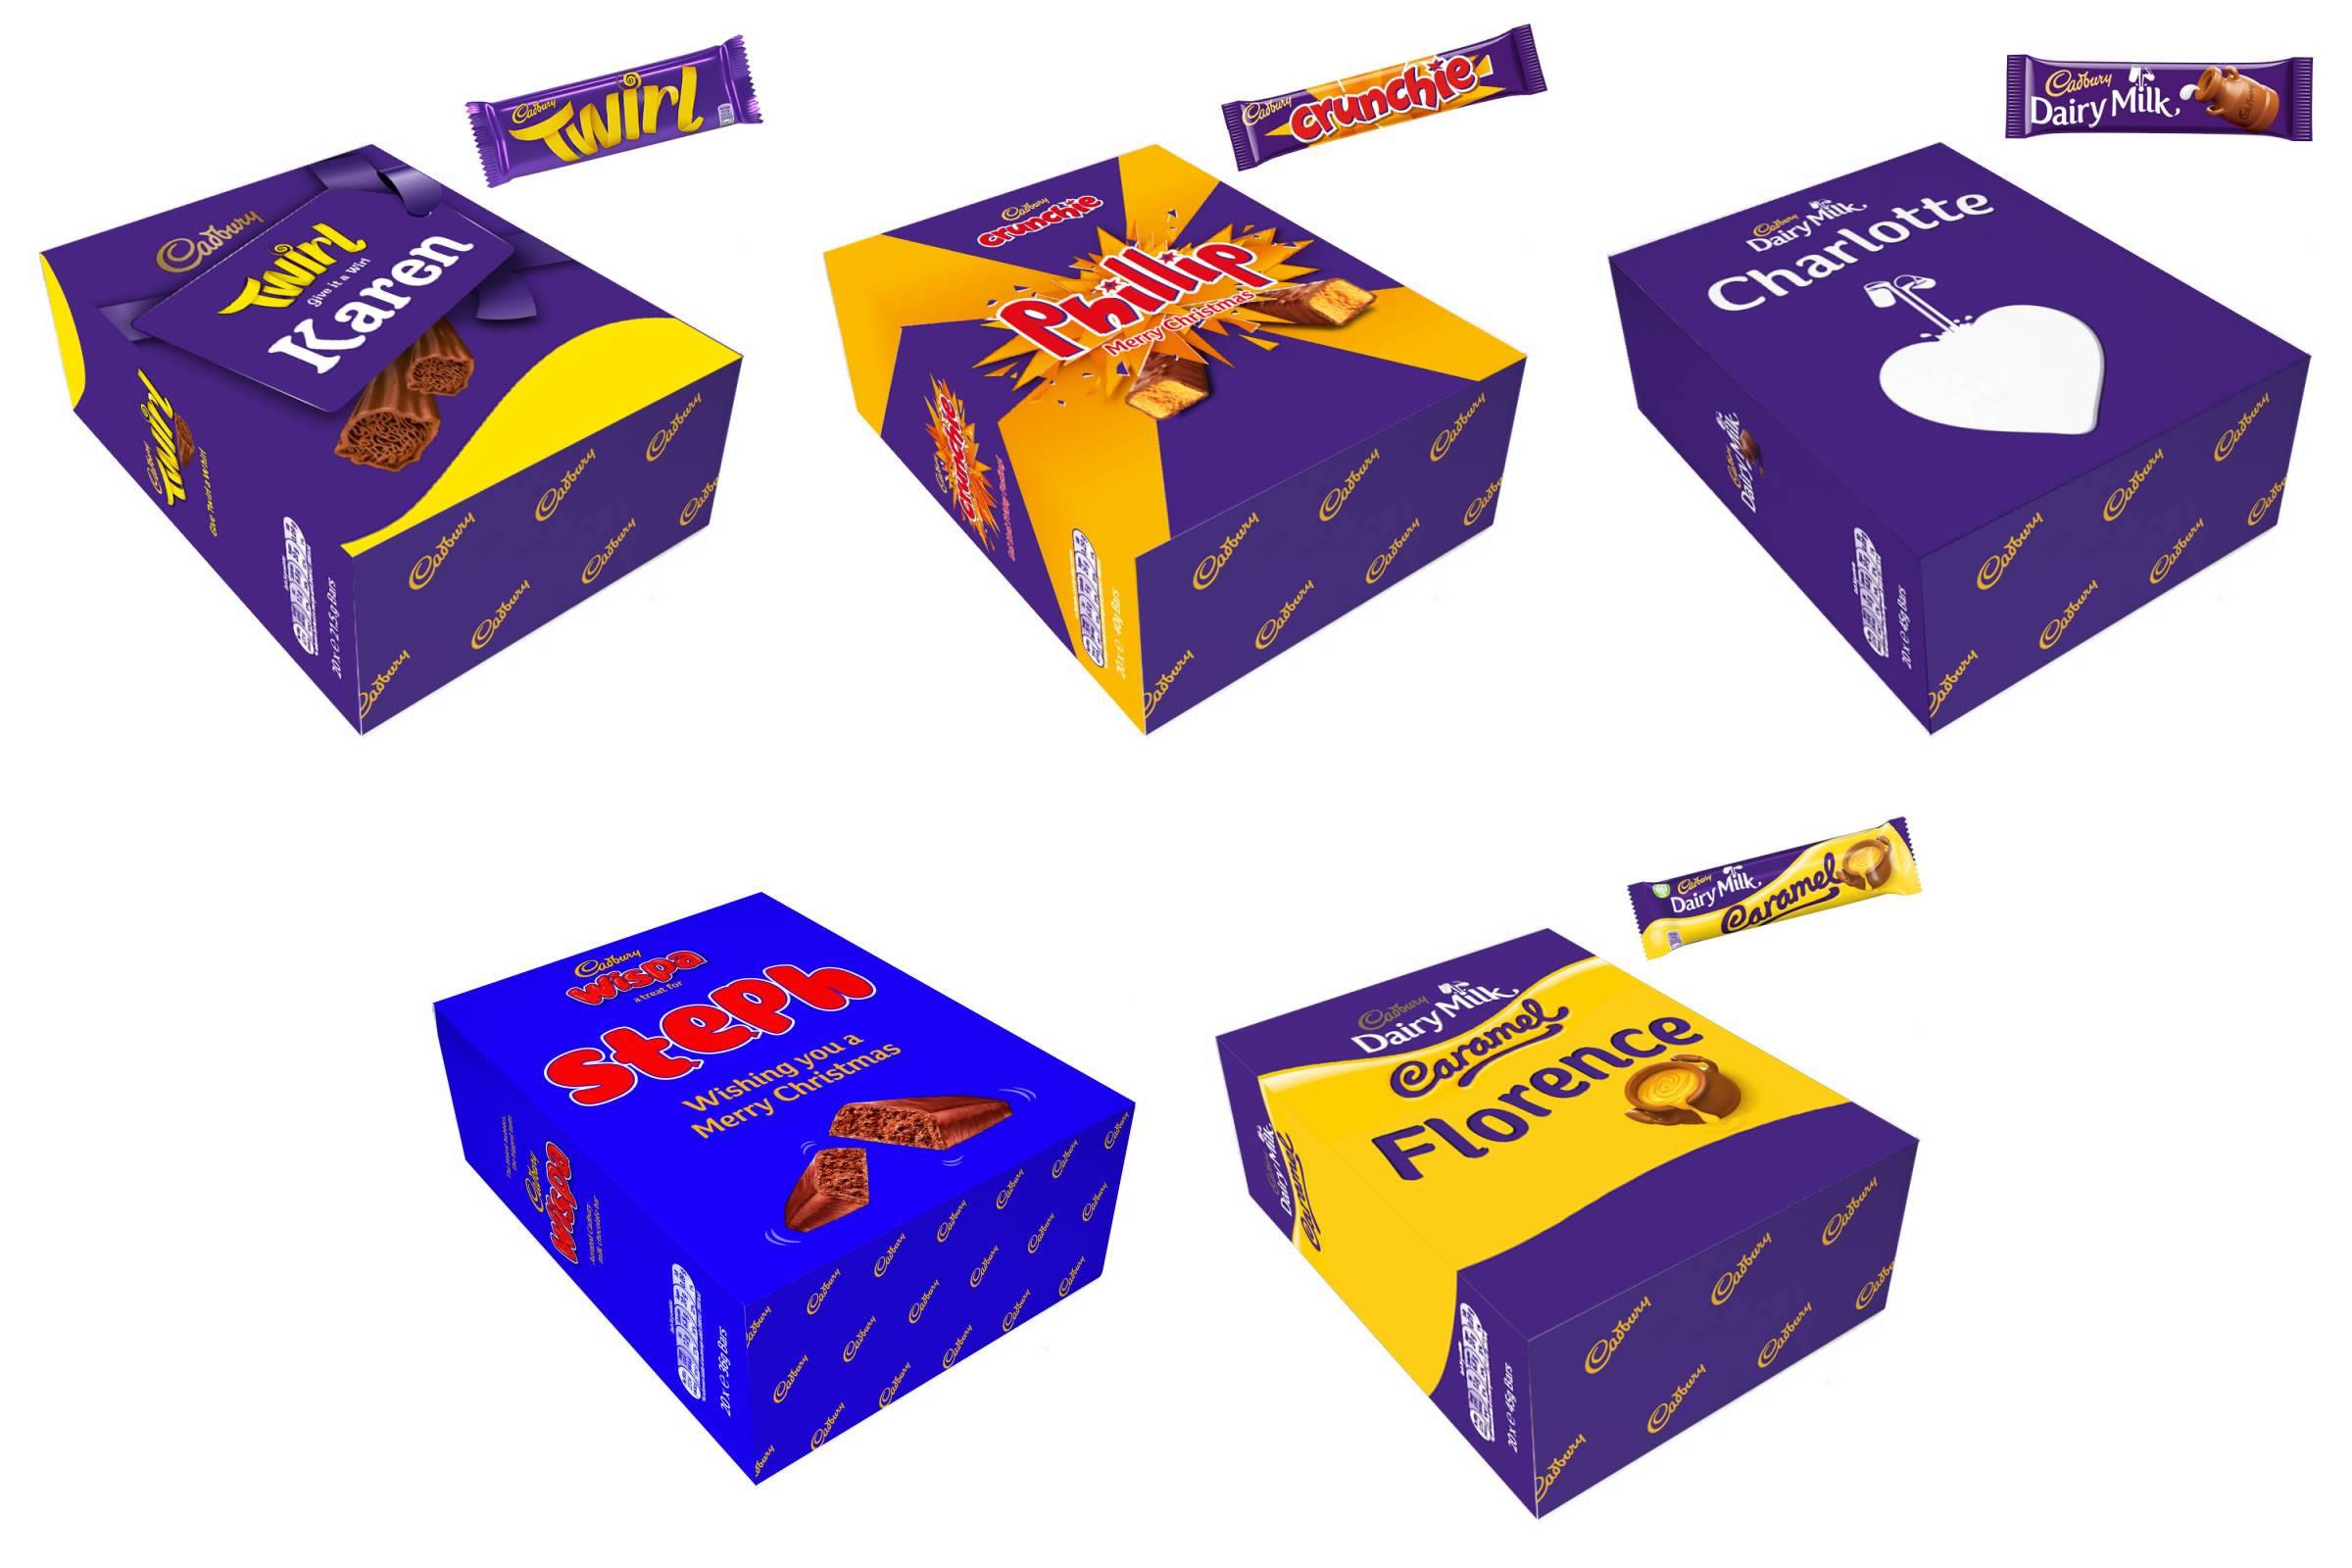 Personalised Cadbury Chocolate Boxes